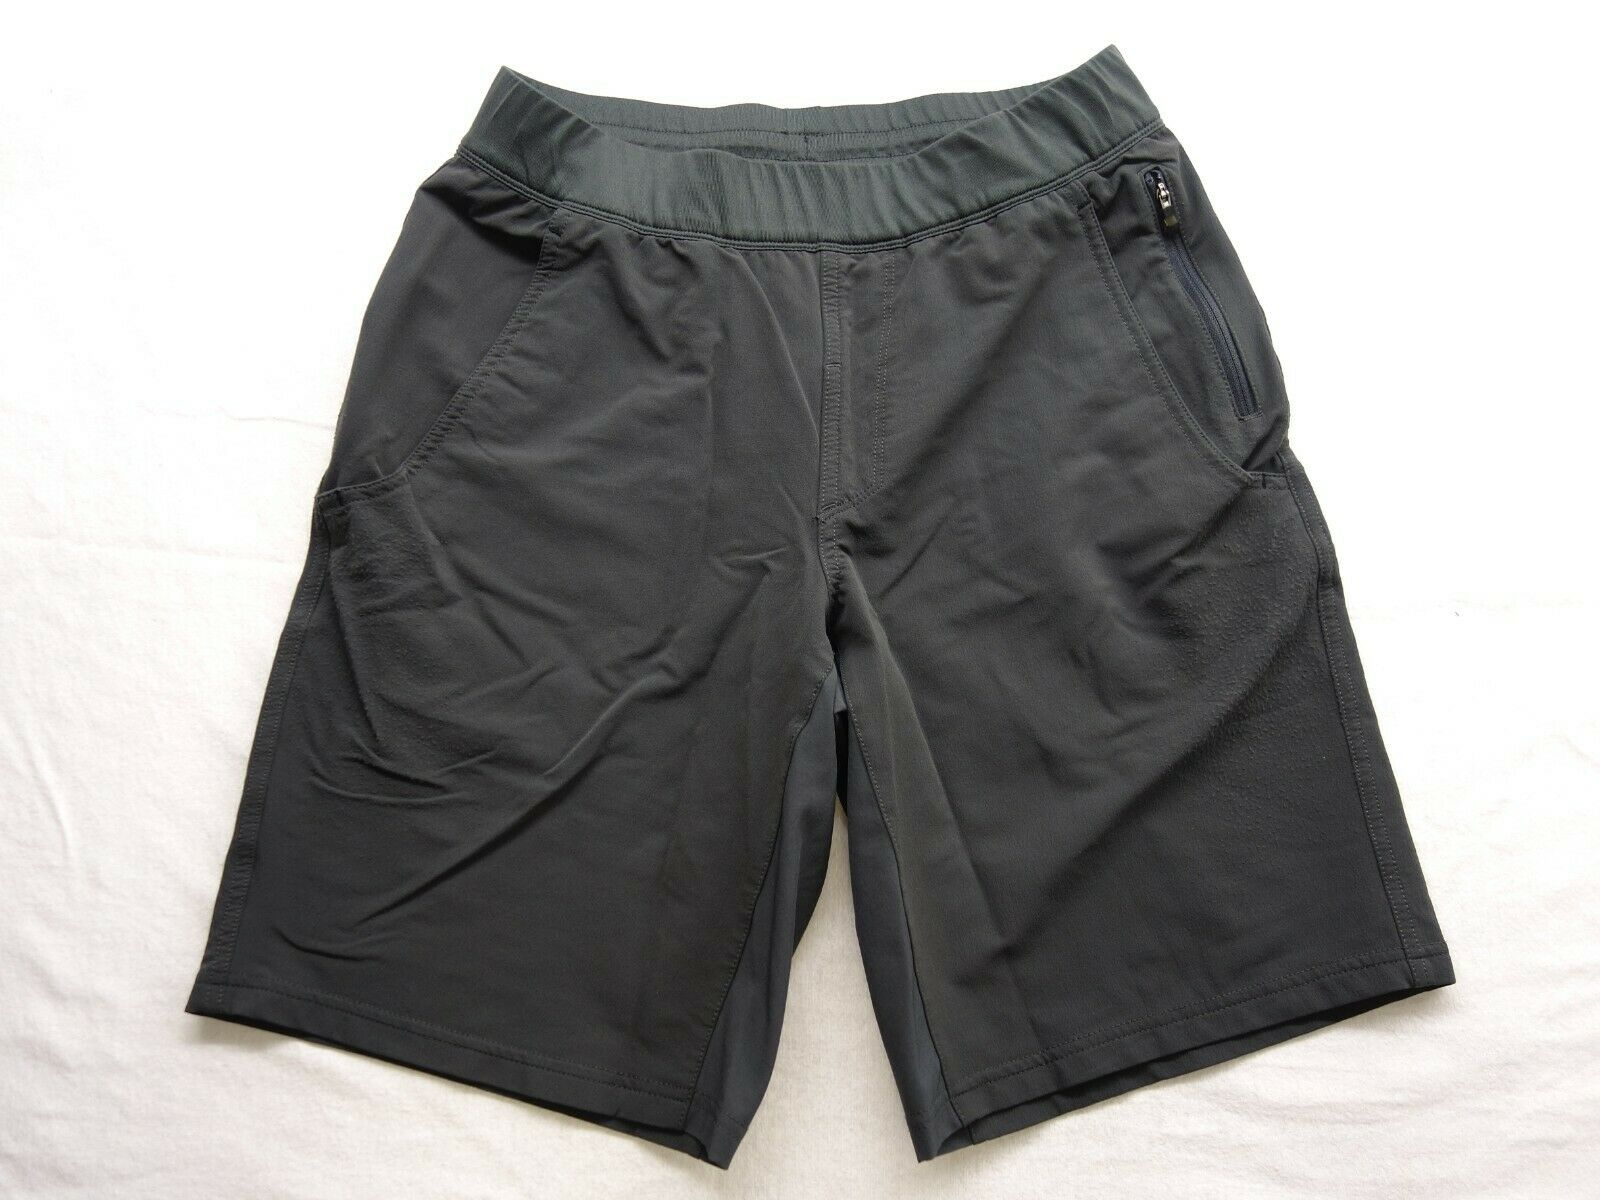 The North Face Taglia S Pantaloncini Pantaloncini Pantaloncini da Uomo Rapida Flash Asciutto Xd Mesh 9edd6b